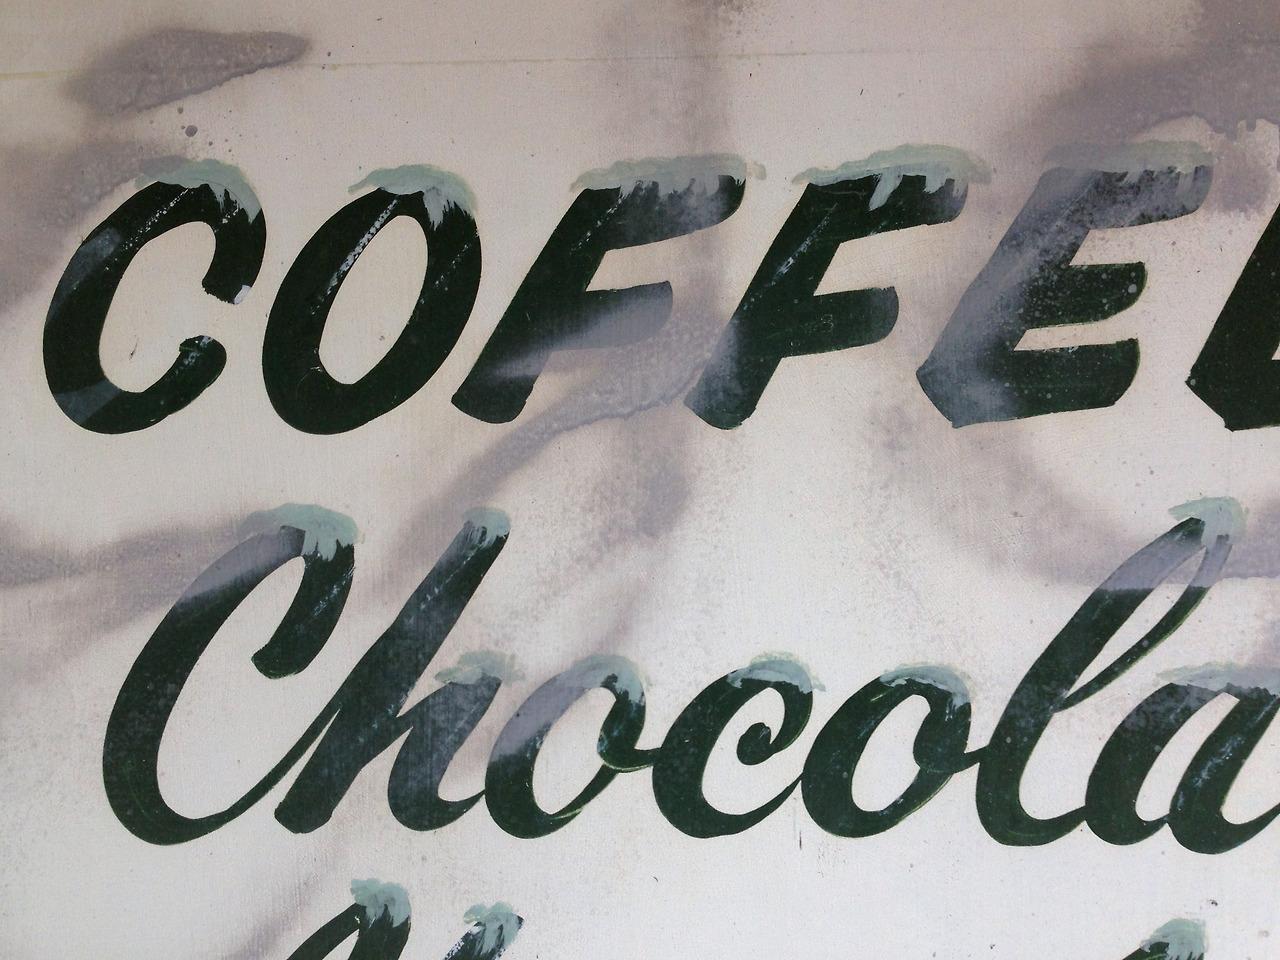 """COFFE Chocola"""